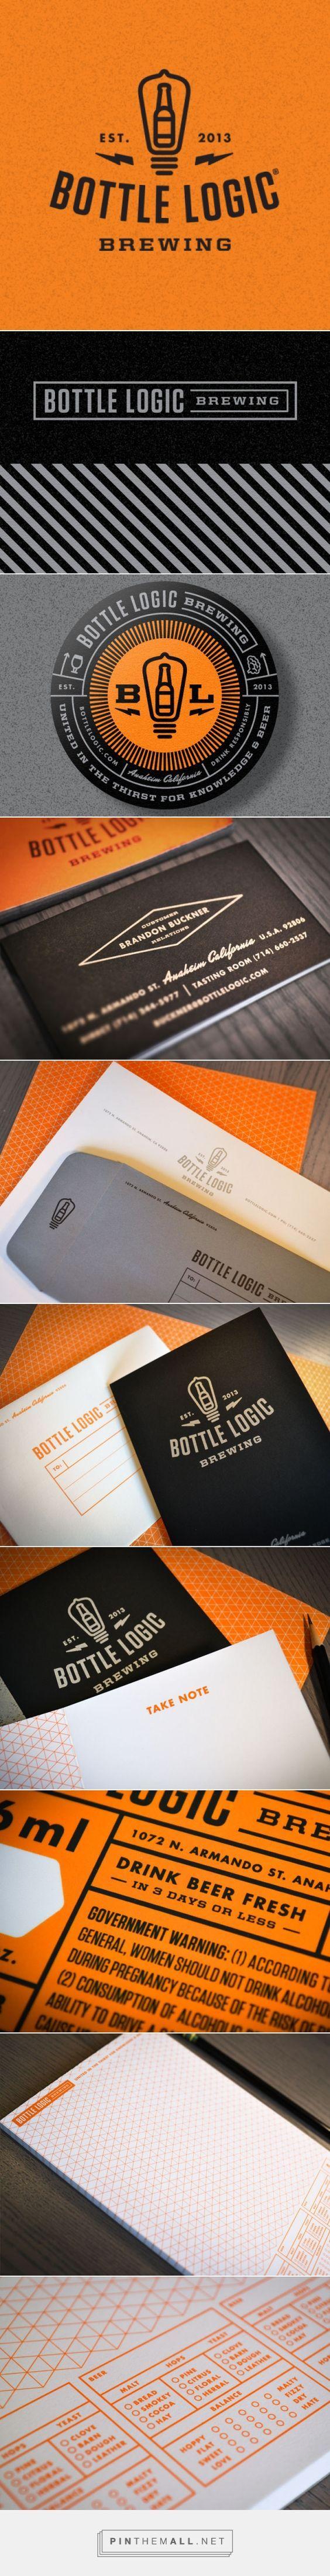 Map Of Oregon Breweries%0A Bottle Logic Brewing Branding   Fivestar Branding  u     Design and Branding  Agency  u     Inspiration Gallery